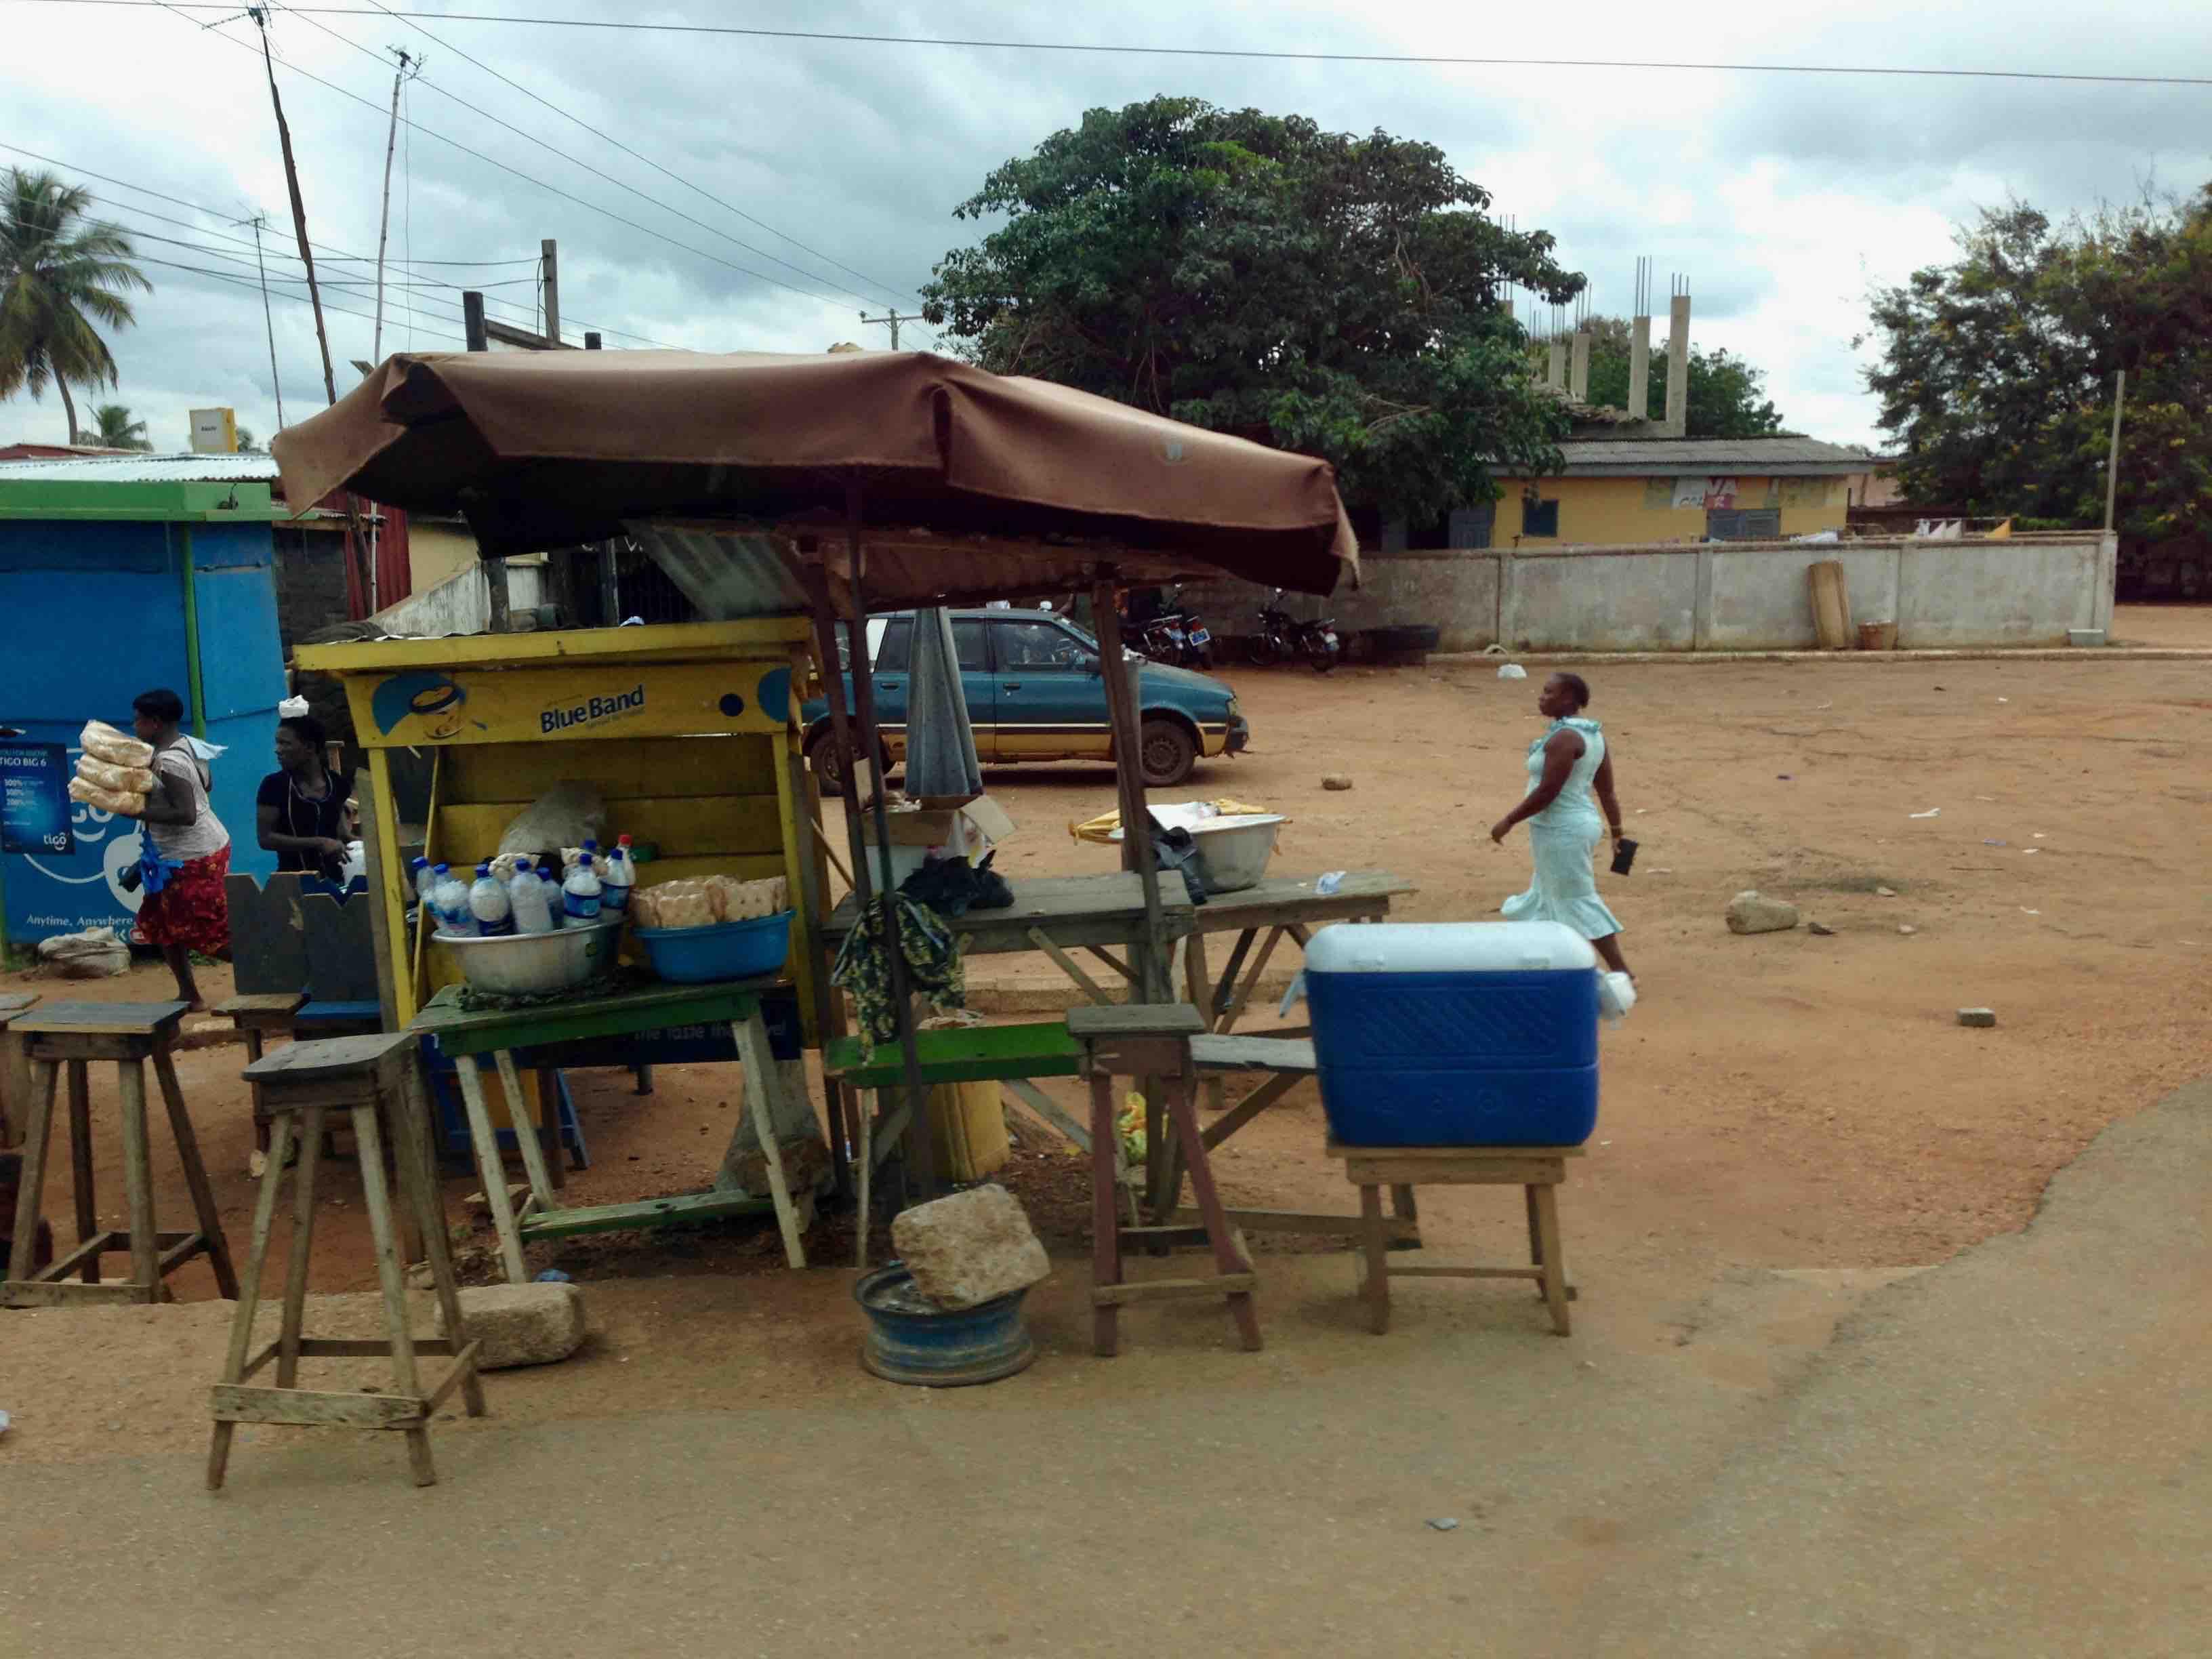 Street Market Scene, Sogakofe, Volta, Ghana. #JujuFilms